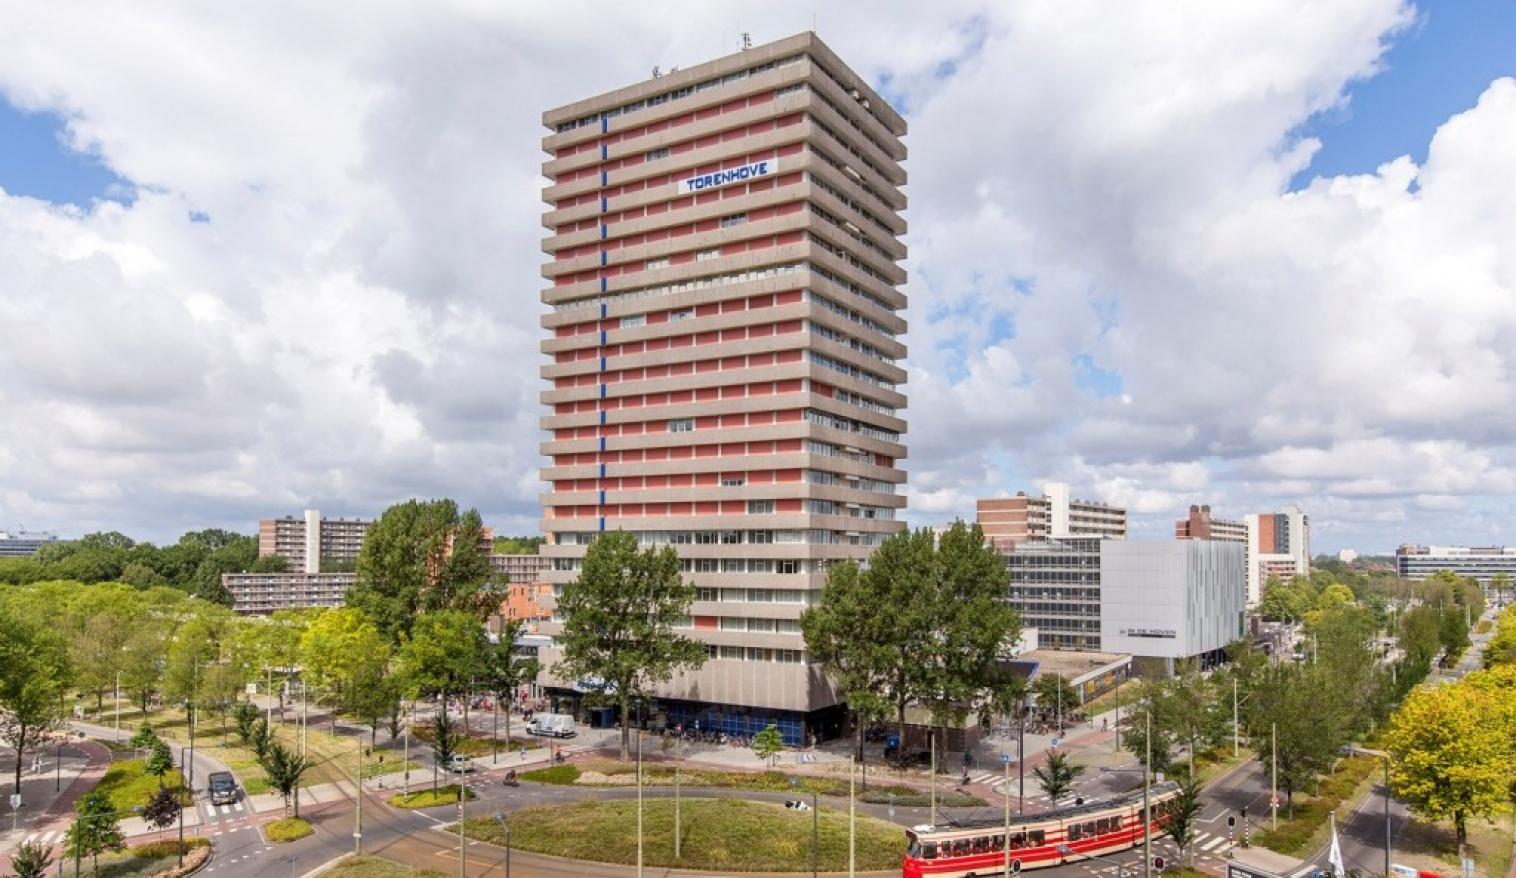 01 OPLarchitecten_TreeHouse Delft 1516×878-72dpi